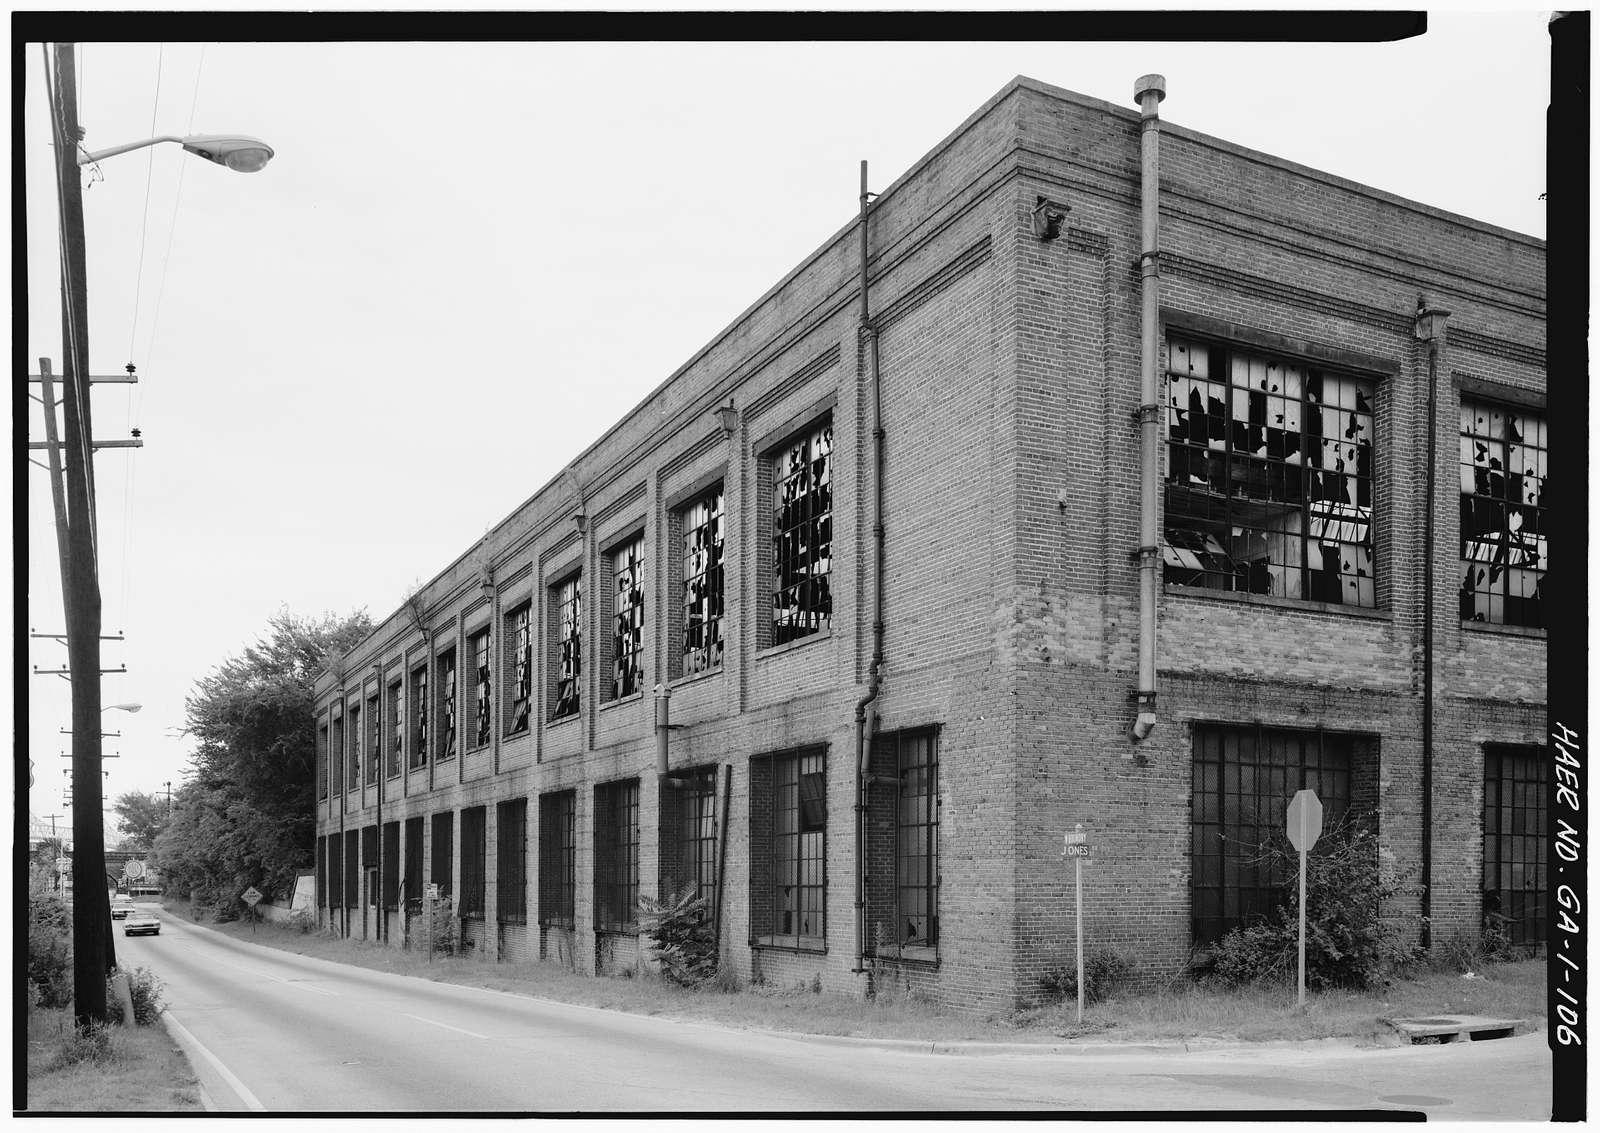 Central of Georgia Railway, Savannah Repair Shops & Terminal Facilities, Paint & Coach Barn, Bounded by West Broad, Jones, West Boundary & Hull Streets, Savannah, Chatham County, GA